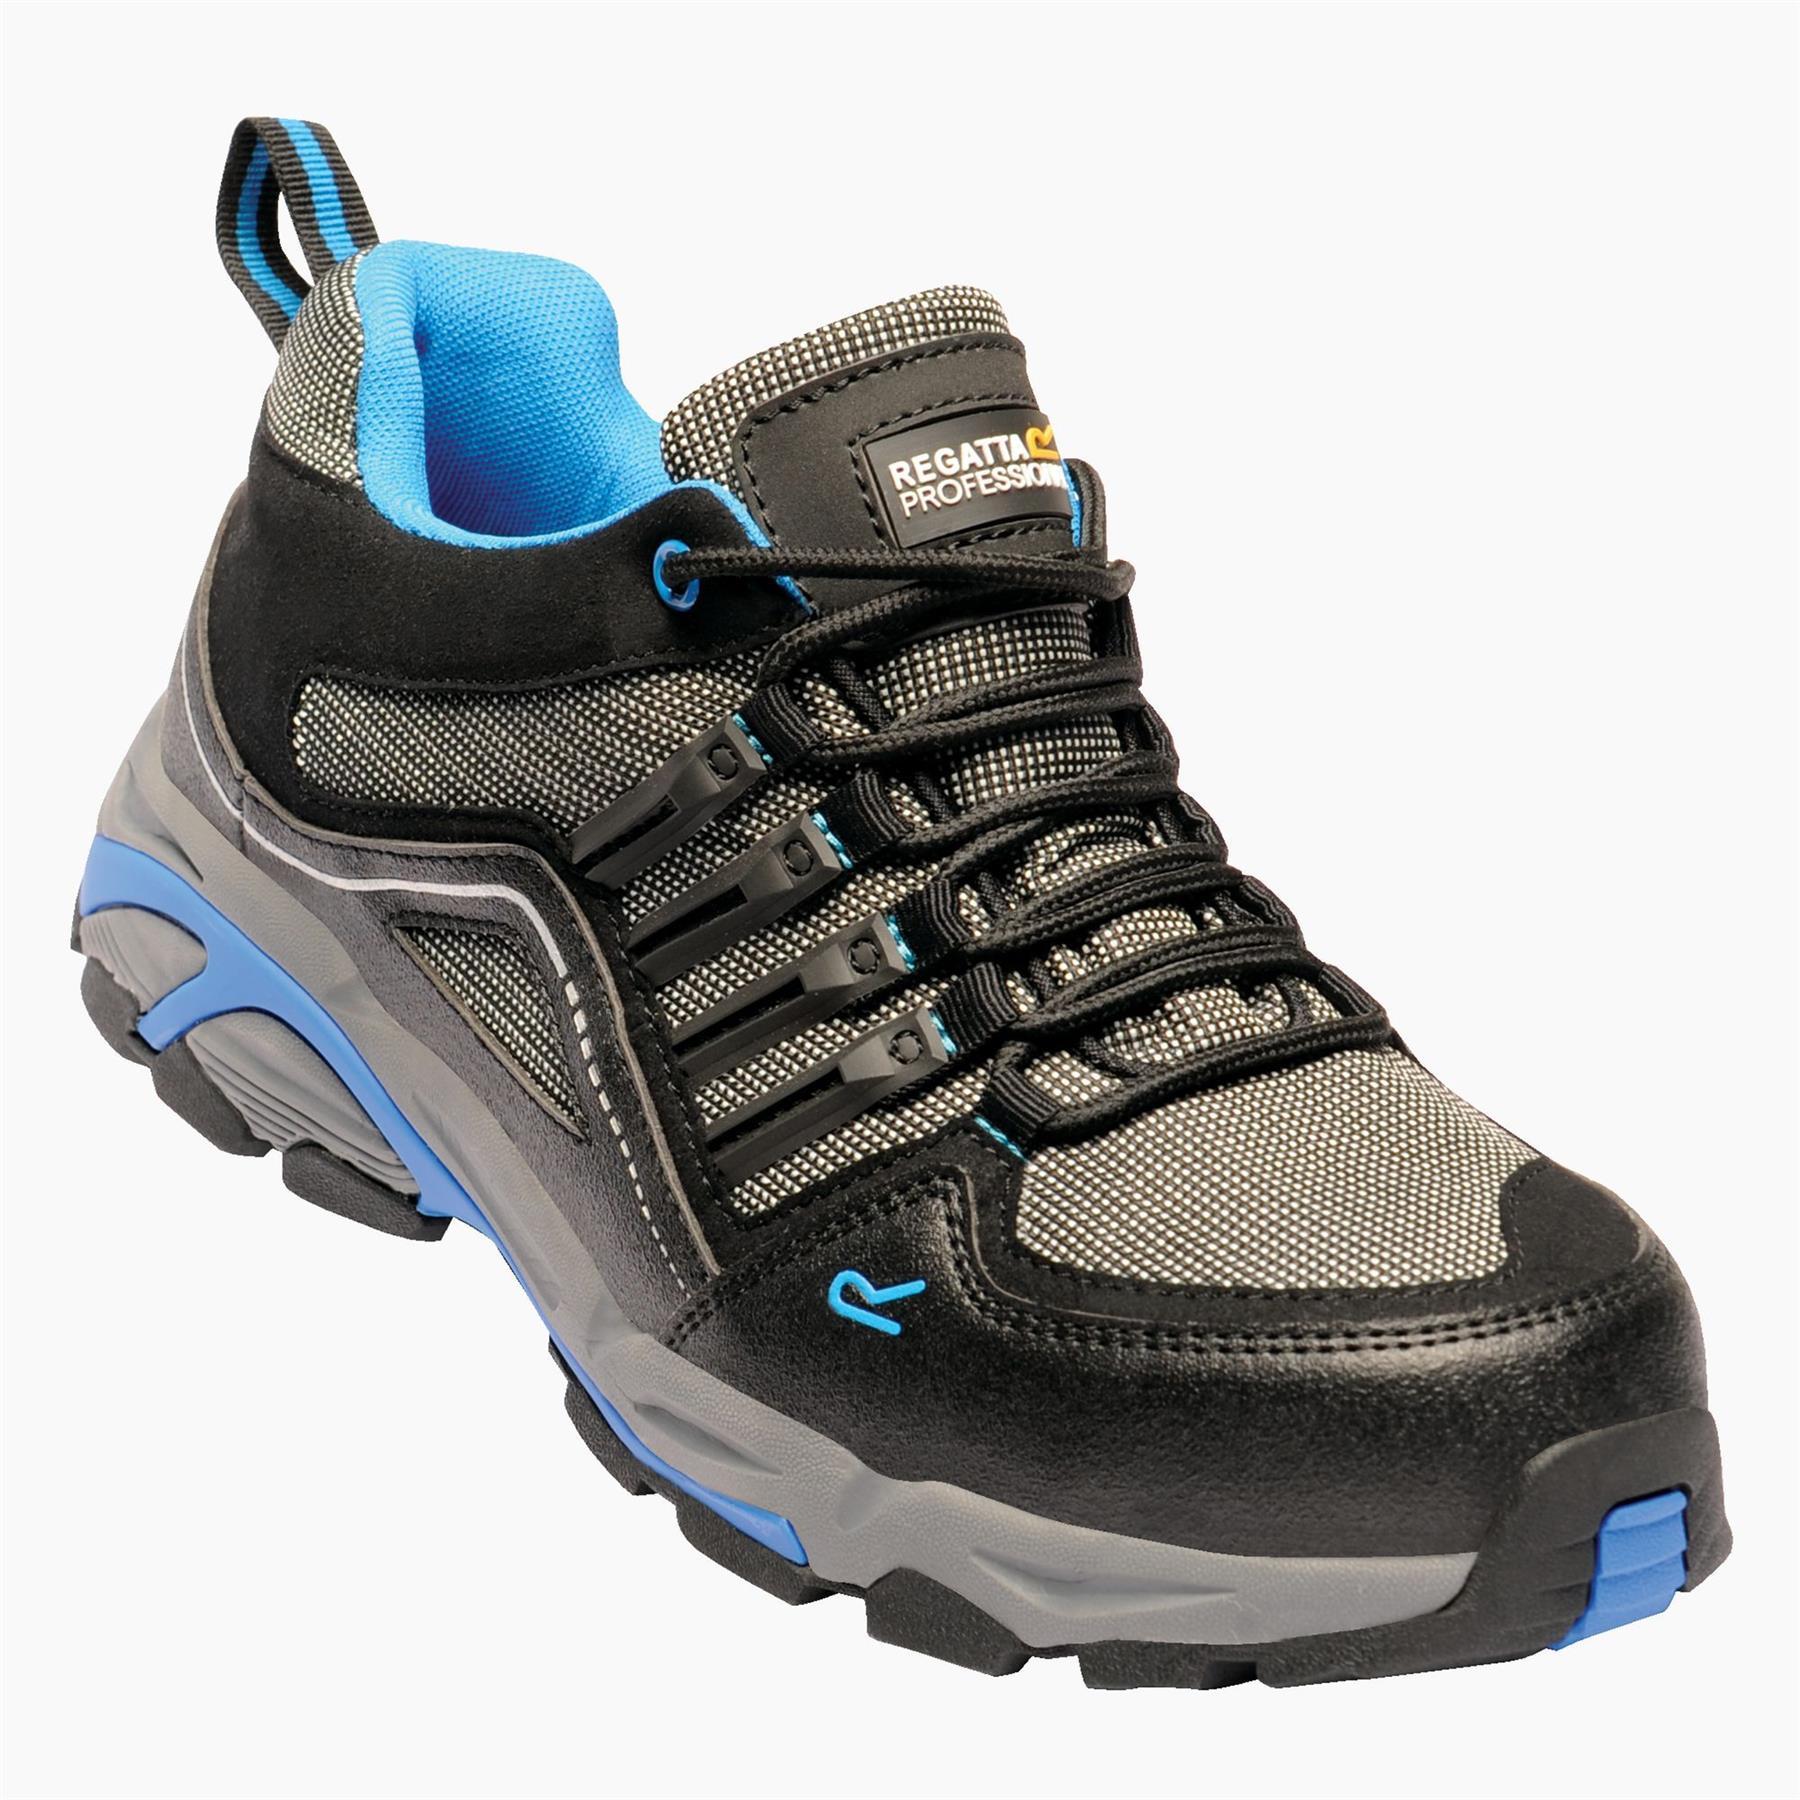 miniatuur 6 - Regatta Mens Work Safety Protective Shoes Steel Toe Cap Boots Workwear